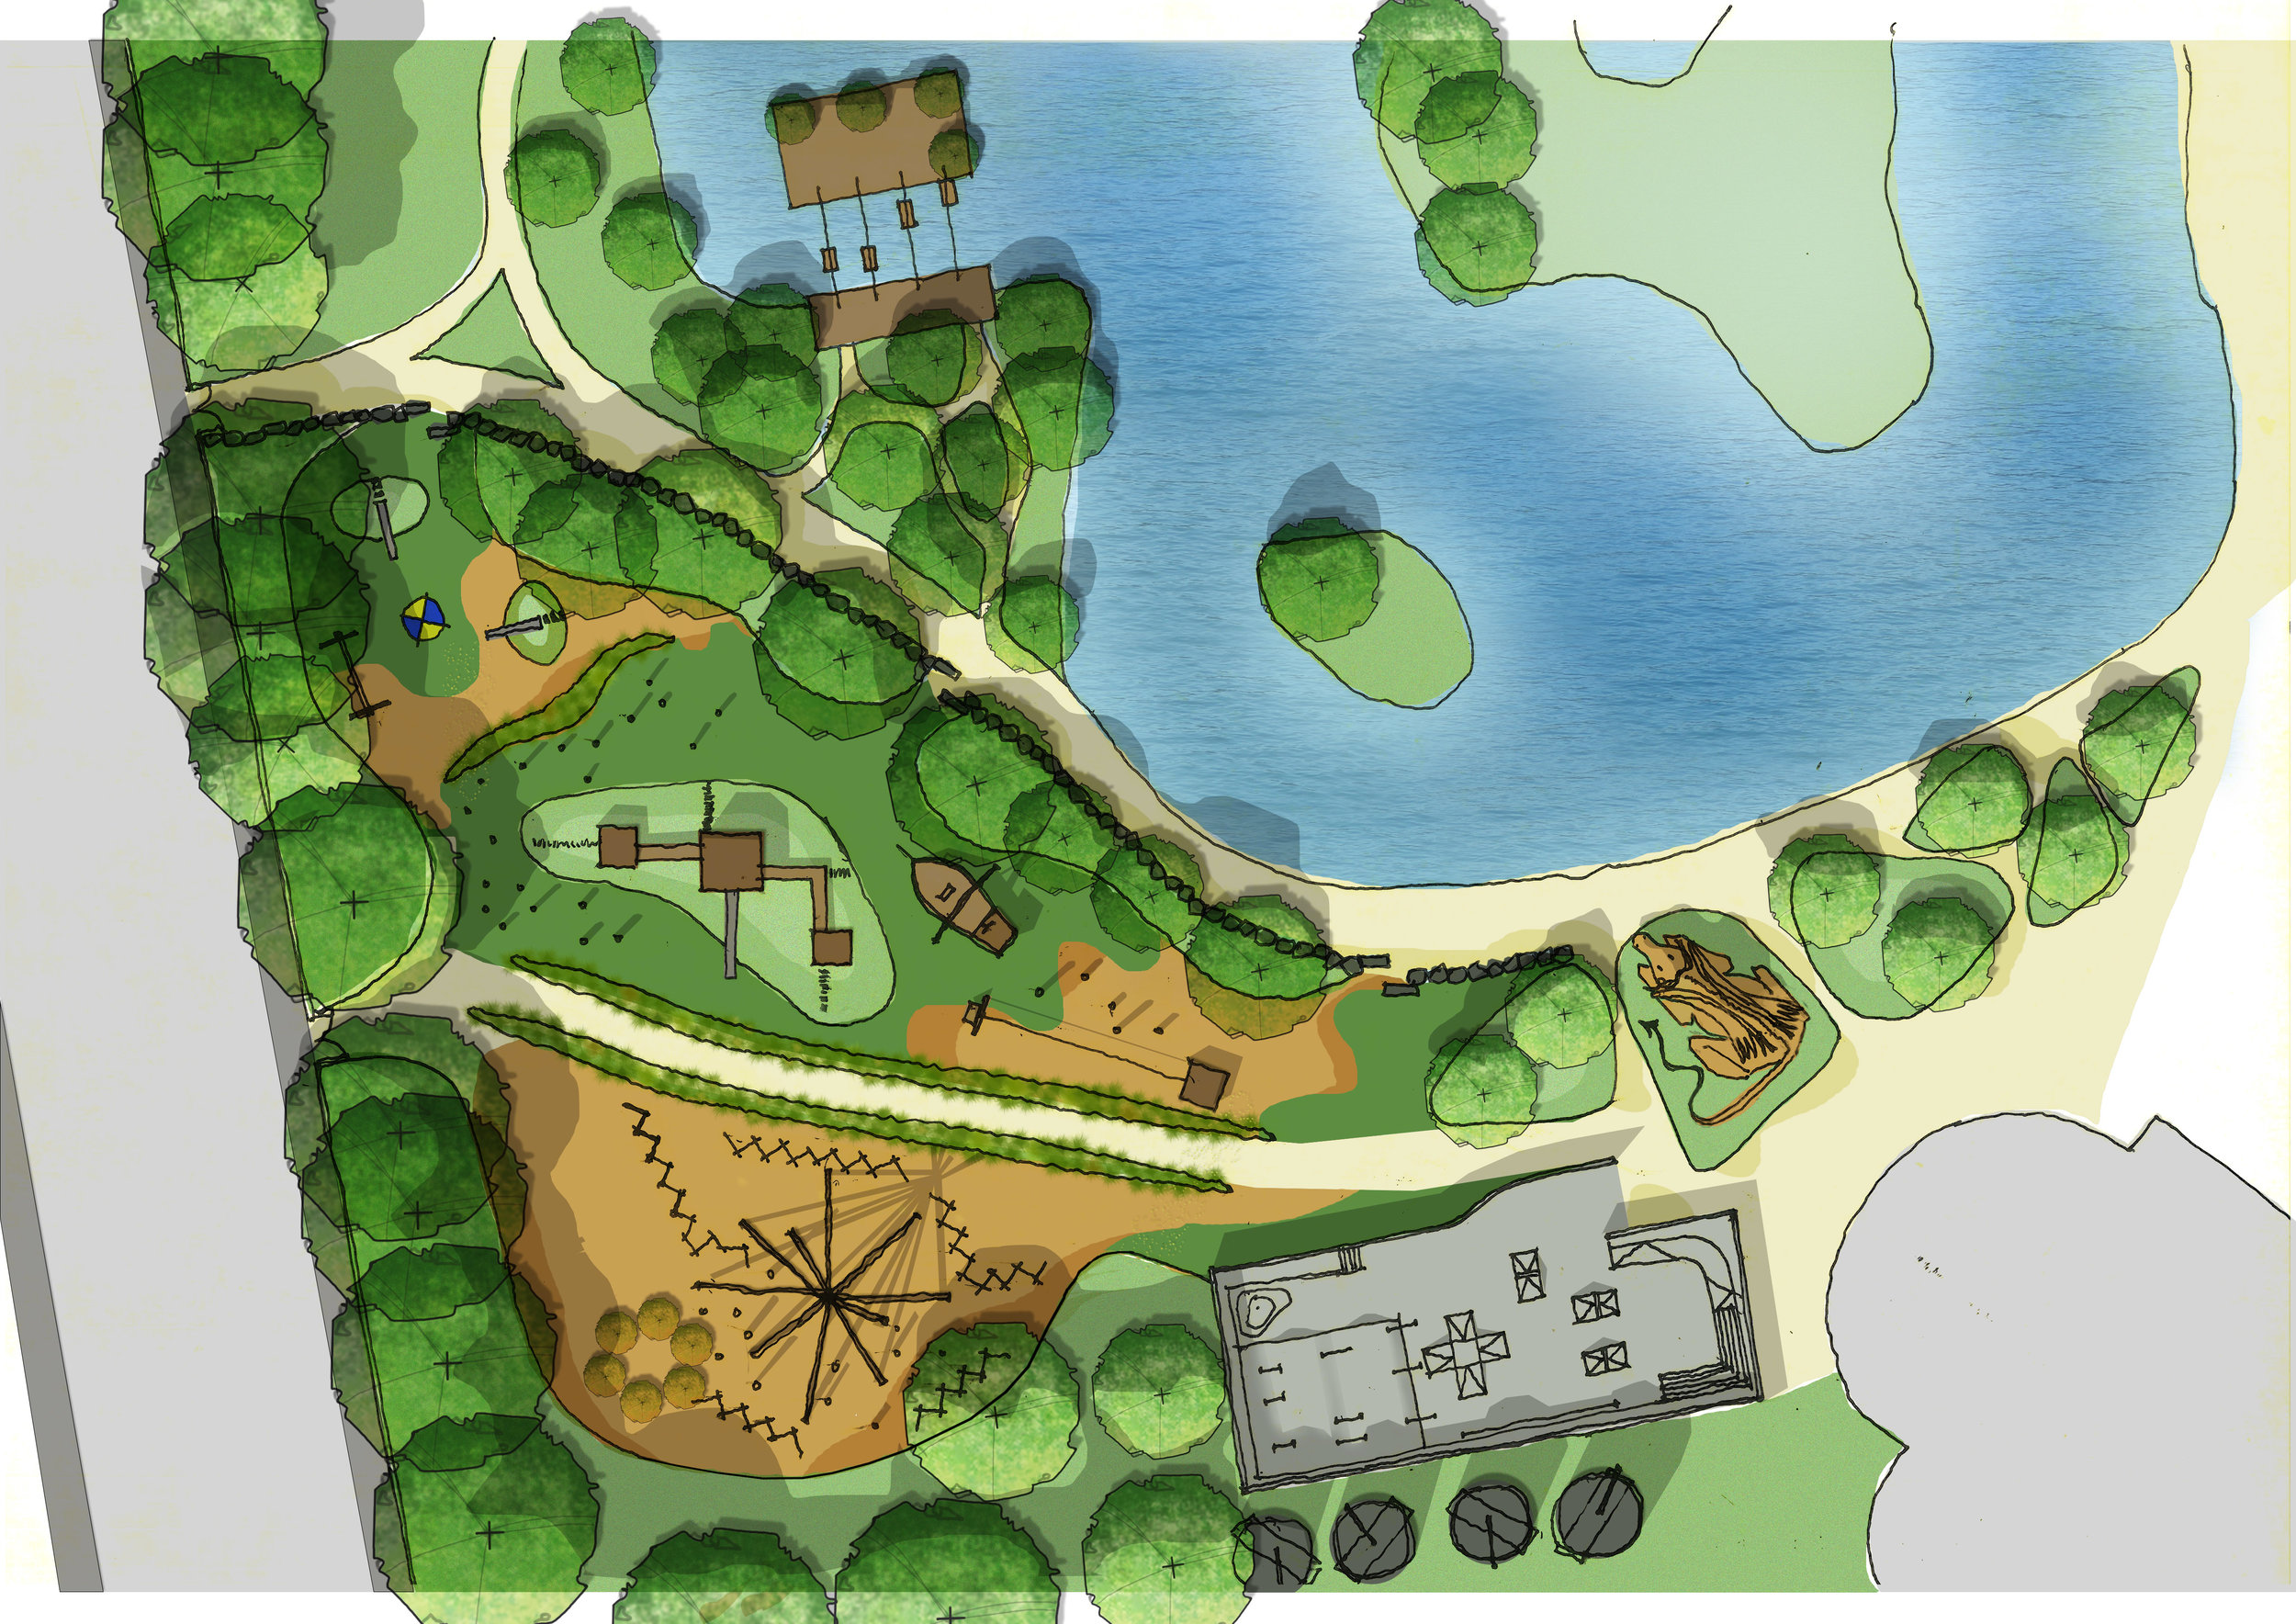 141215_Sketch playground plan_A3.jpg